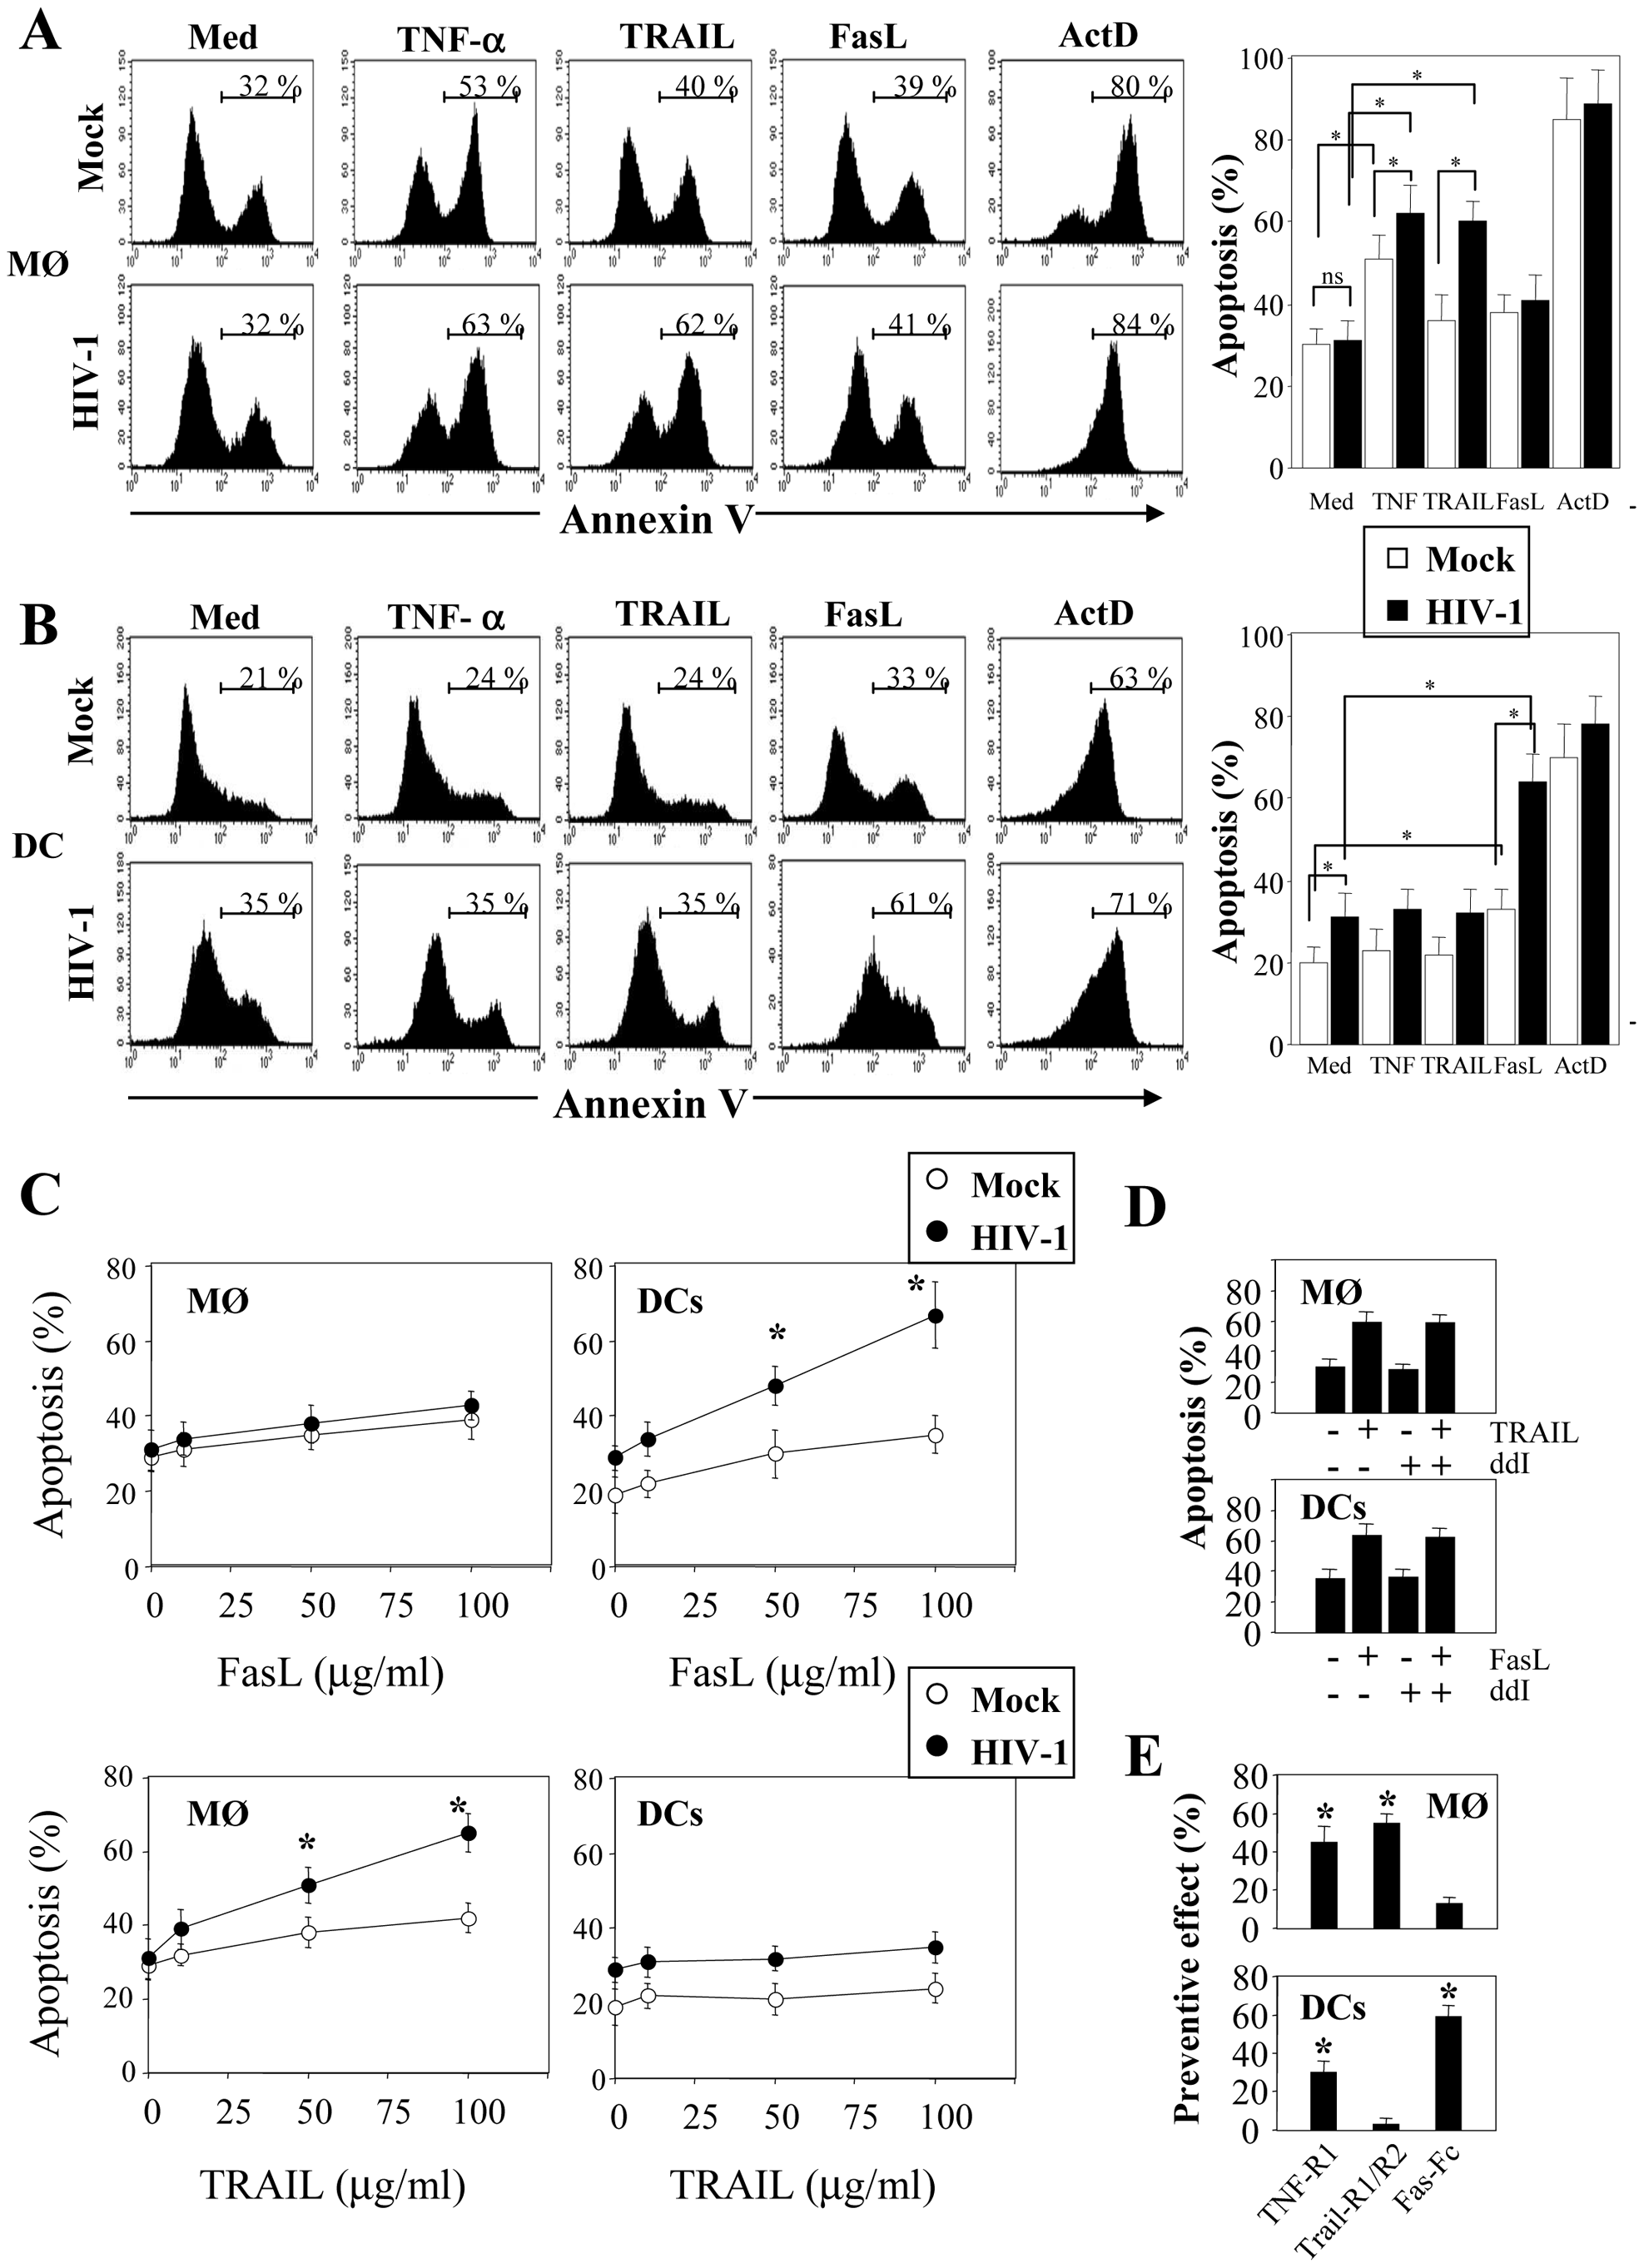 HIV-1 sensitizes monocyte-derived macrophages and monocyte-derived DCs for Death receptor ligands.